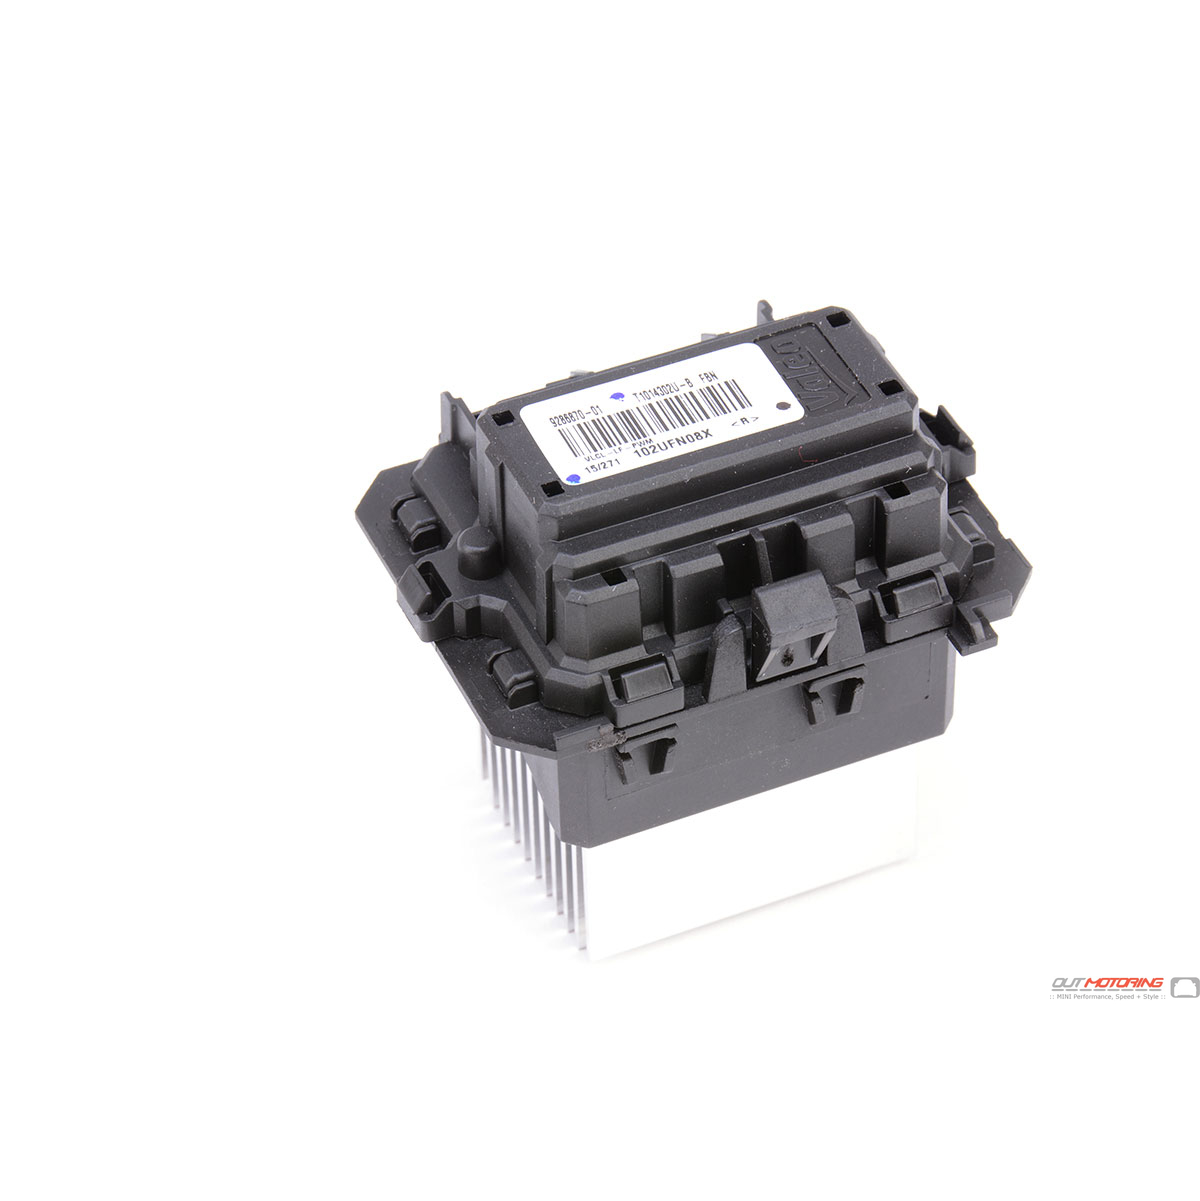 64119286870 MINI Cooper Replacement Parts Blower Regulator